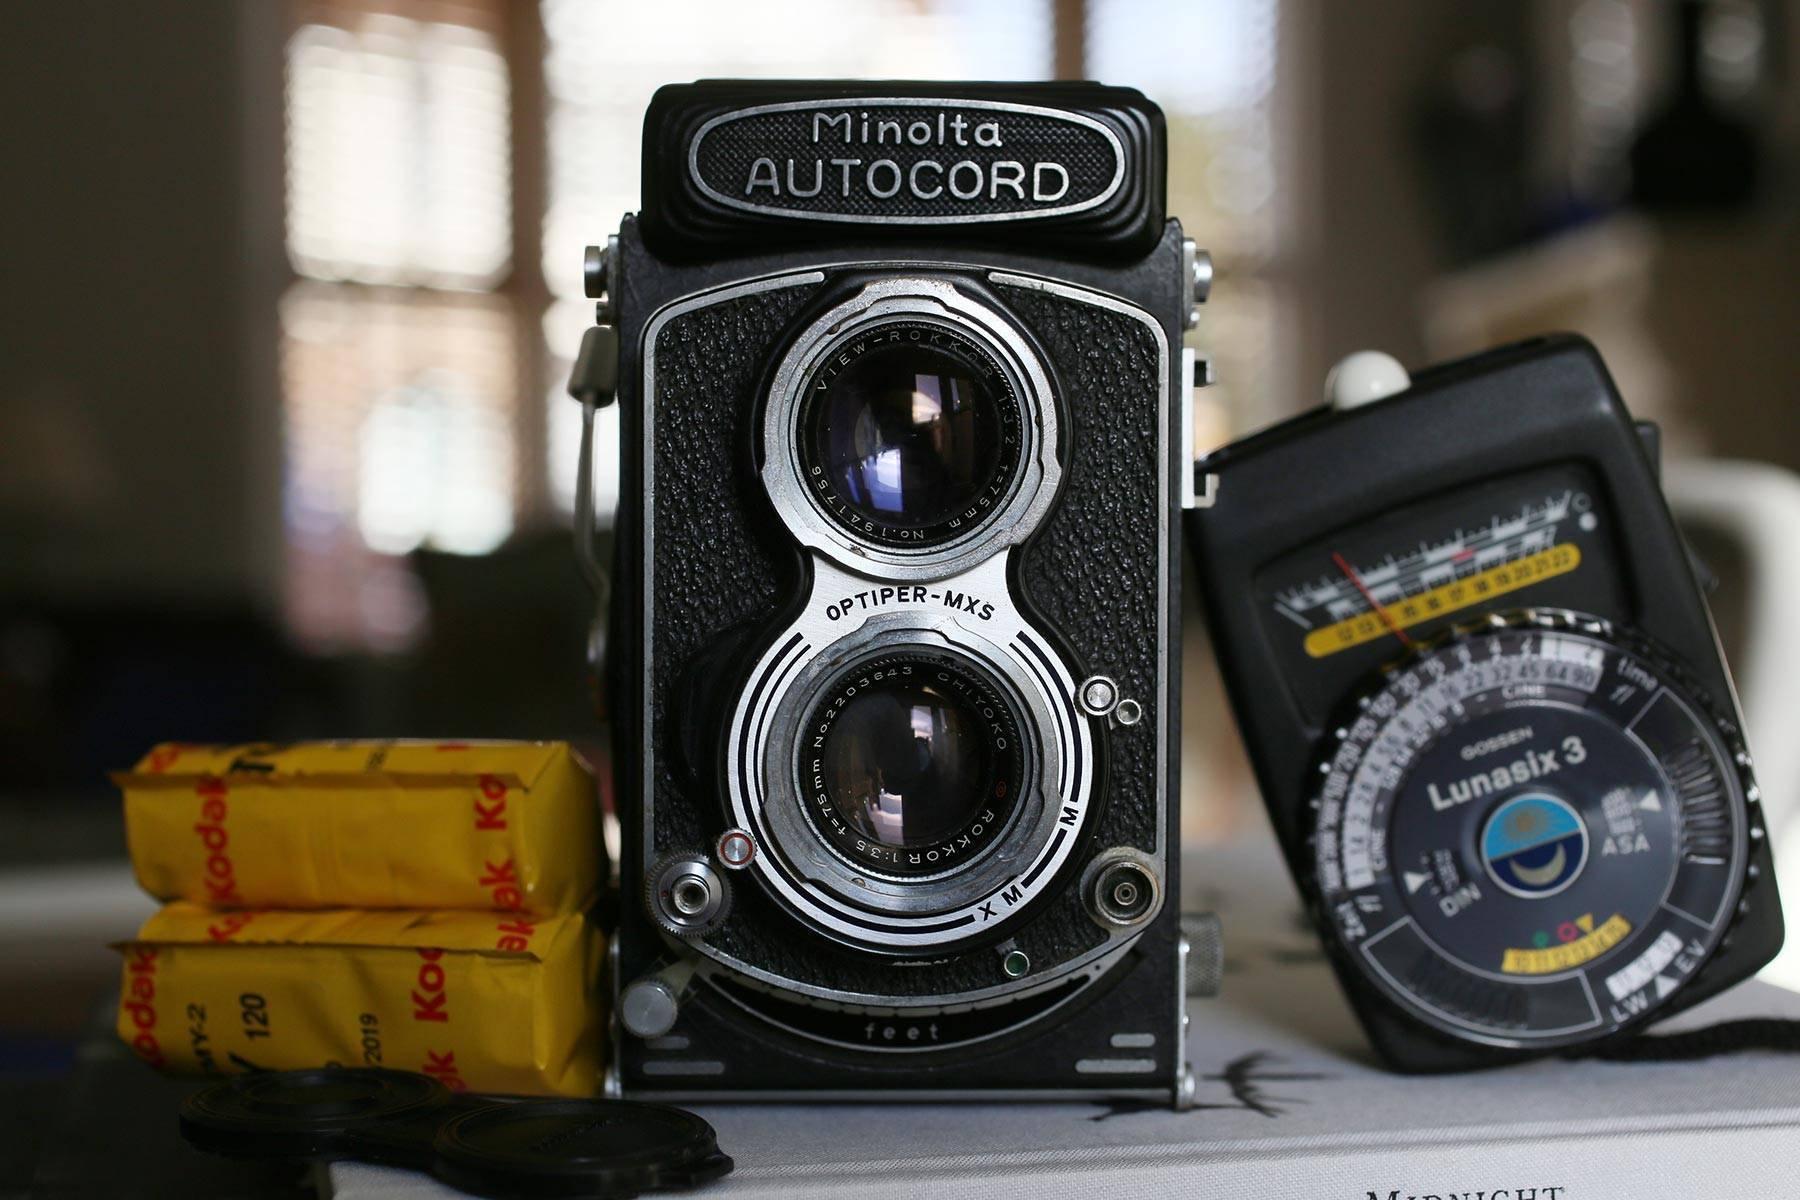 Film Camera Review – Minolta Autocord TLR